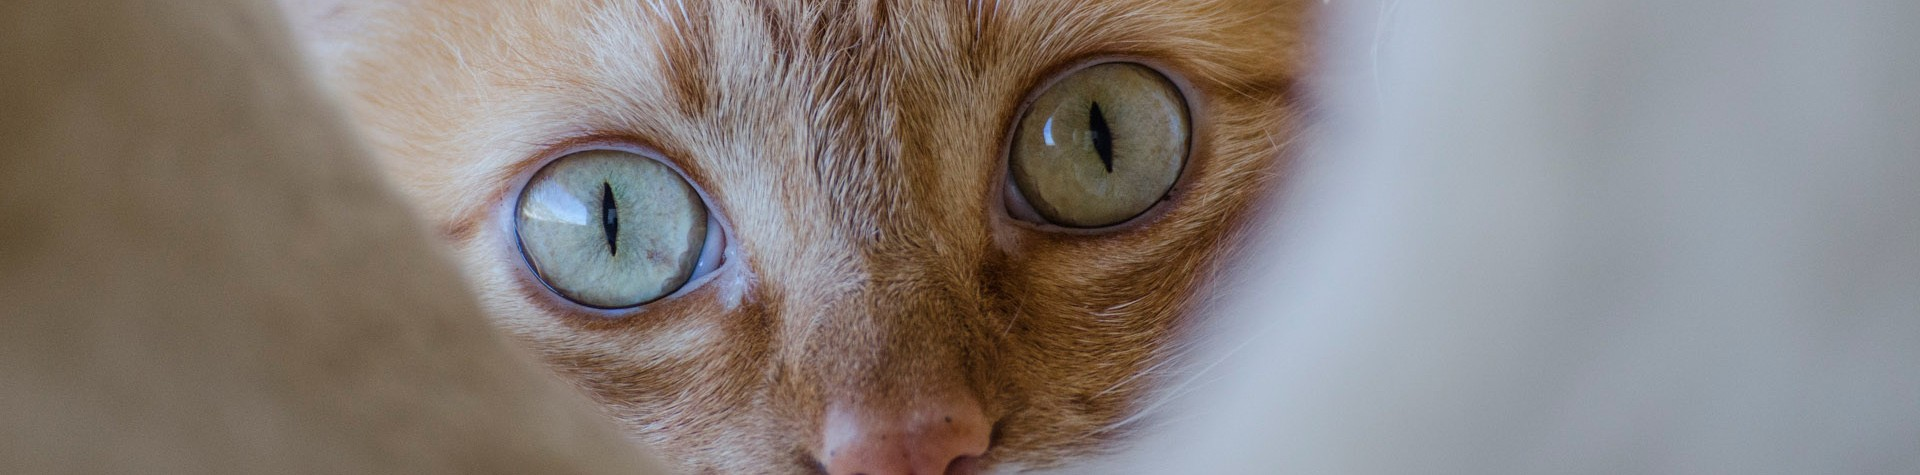 ginger cat close look